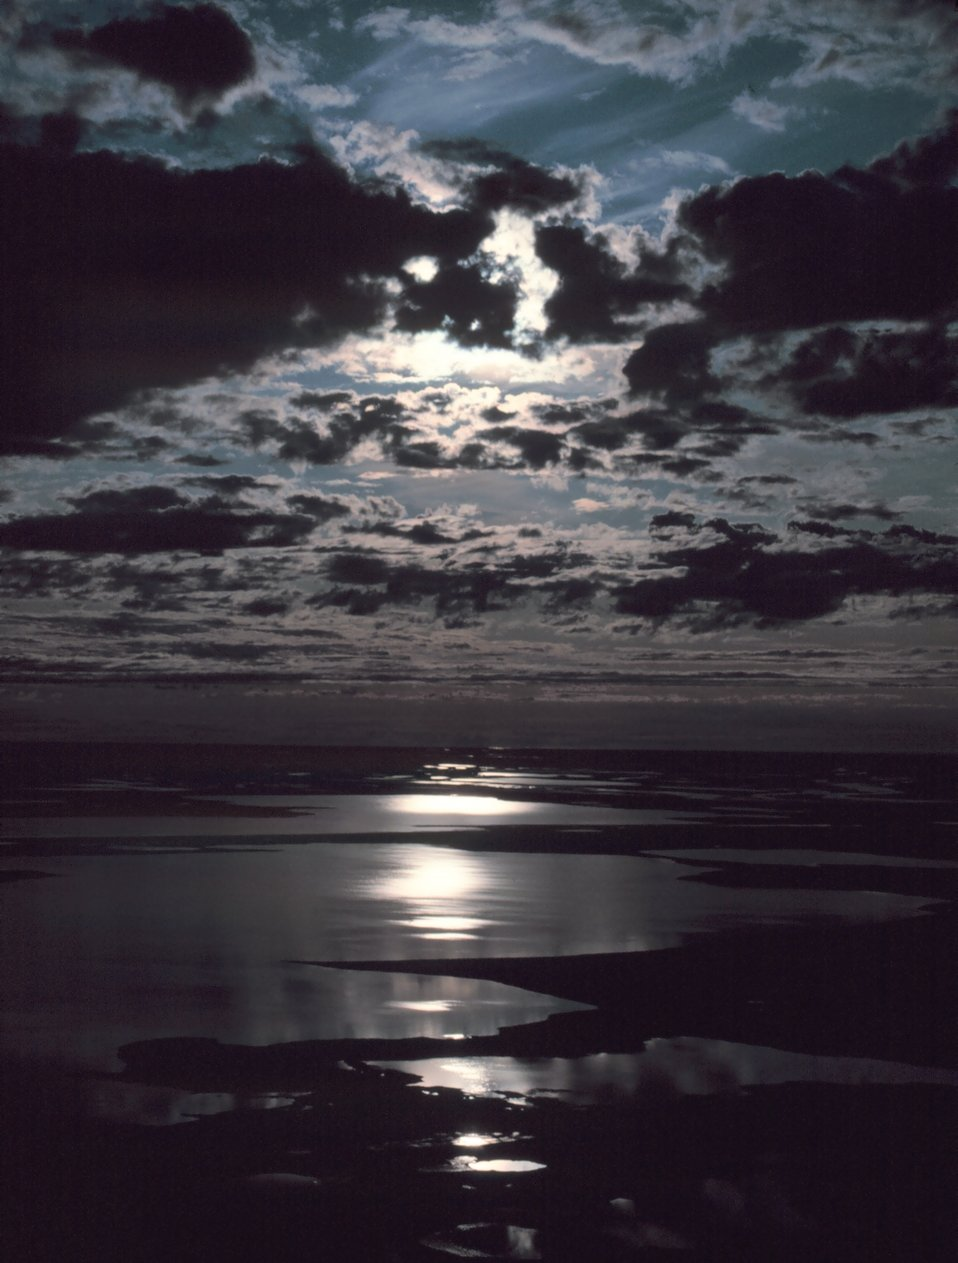 Moonbeams reflecting off the Beaufort Sea.